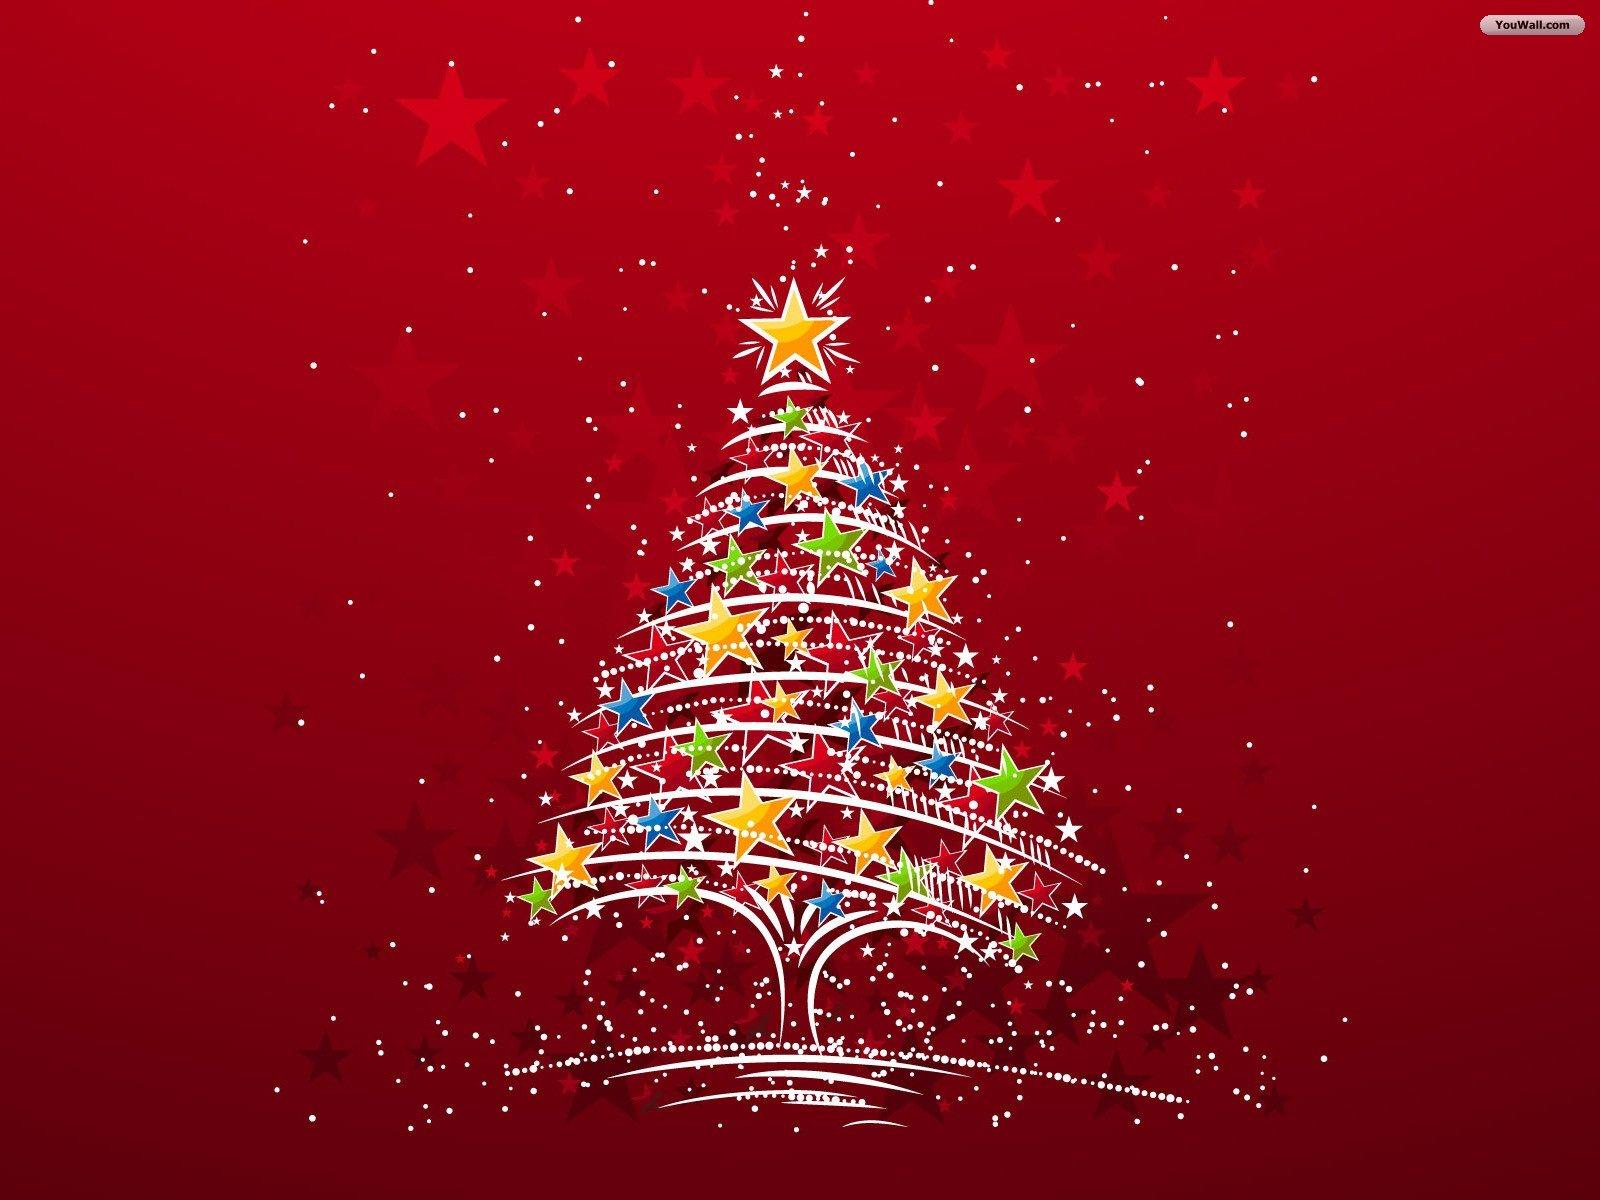 http://1.bp.blogspot.com/-ismZk2deGI0/TvePk614nCI/AAAAAAAABjQ/PmkJNj9WqAU/s1600/merry_christmas_wallpaper_de816.jpg#Merry%20christmas%20to%20you%201600x1200